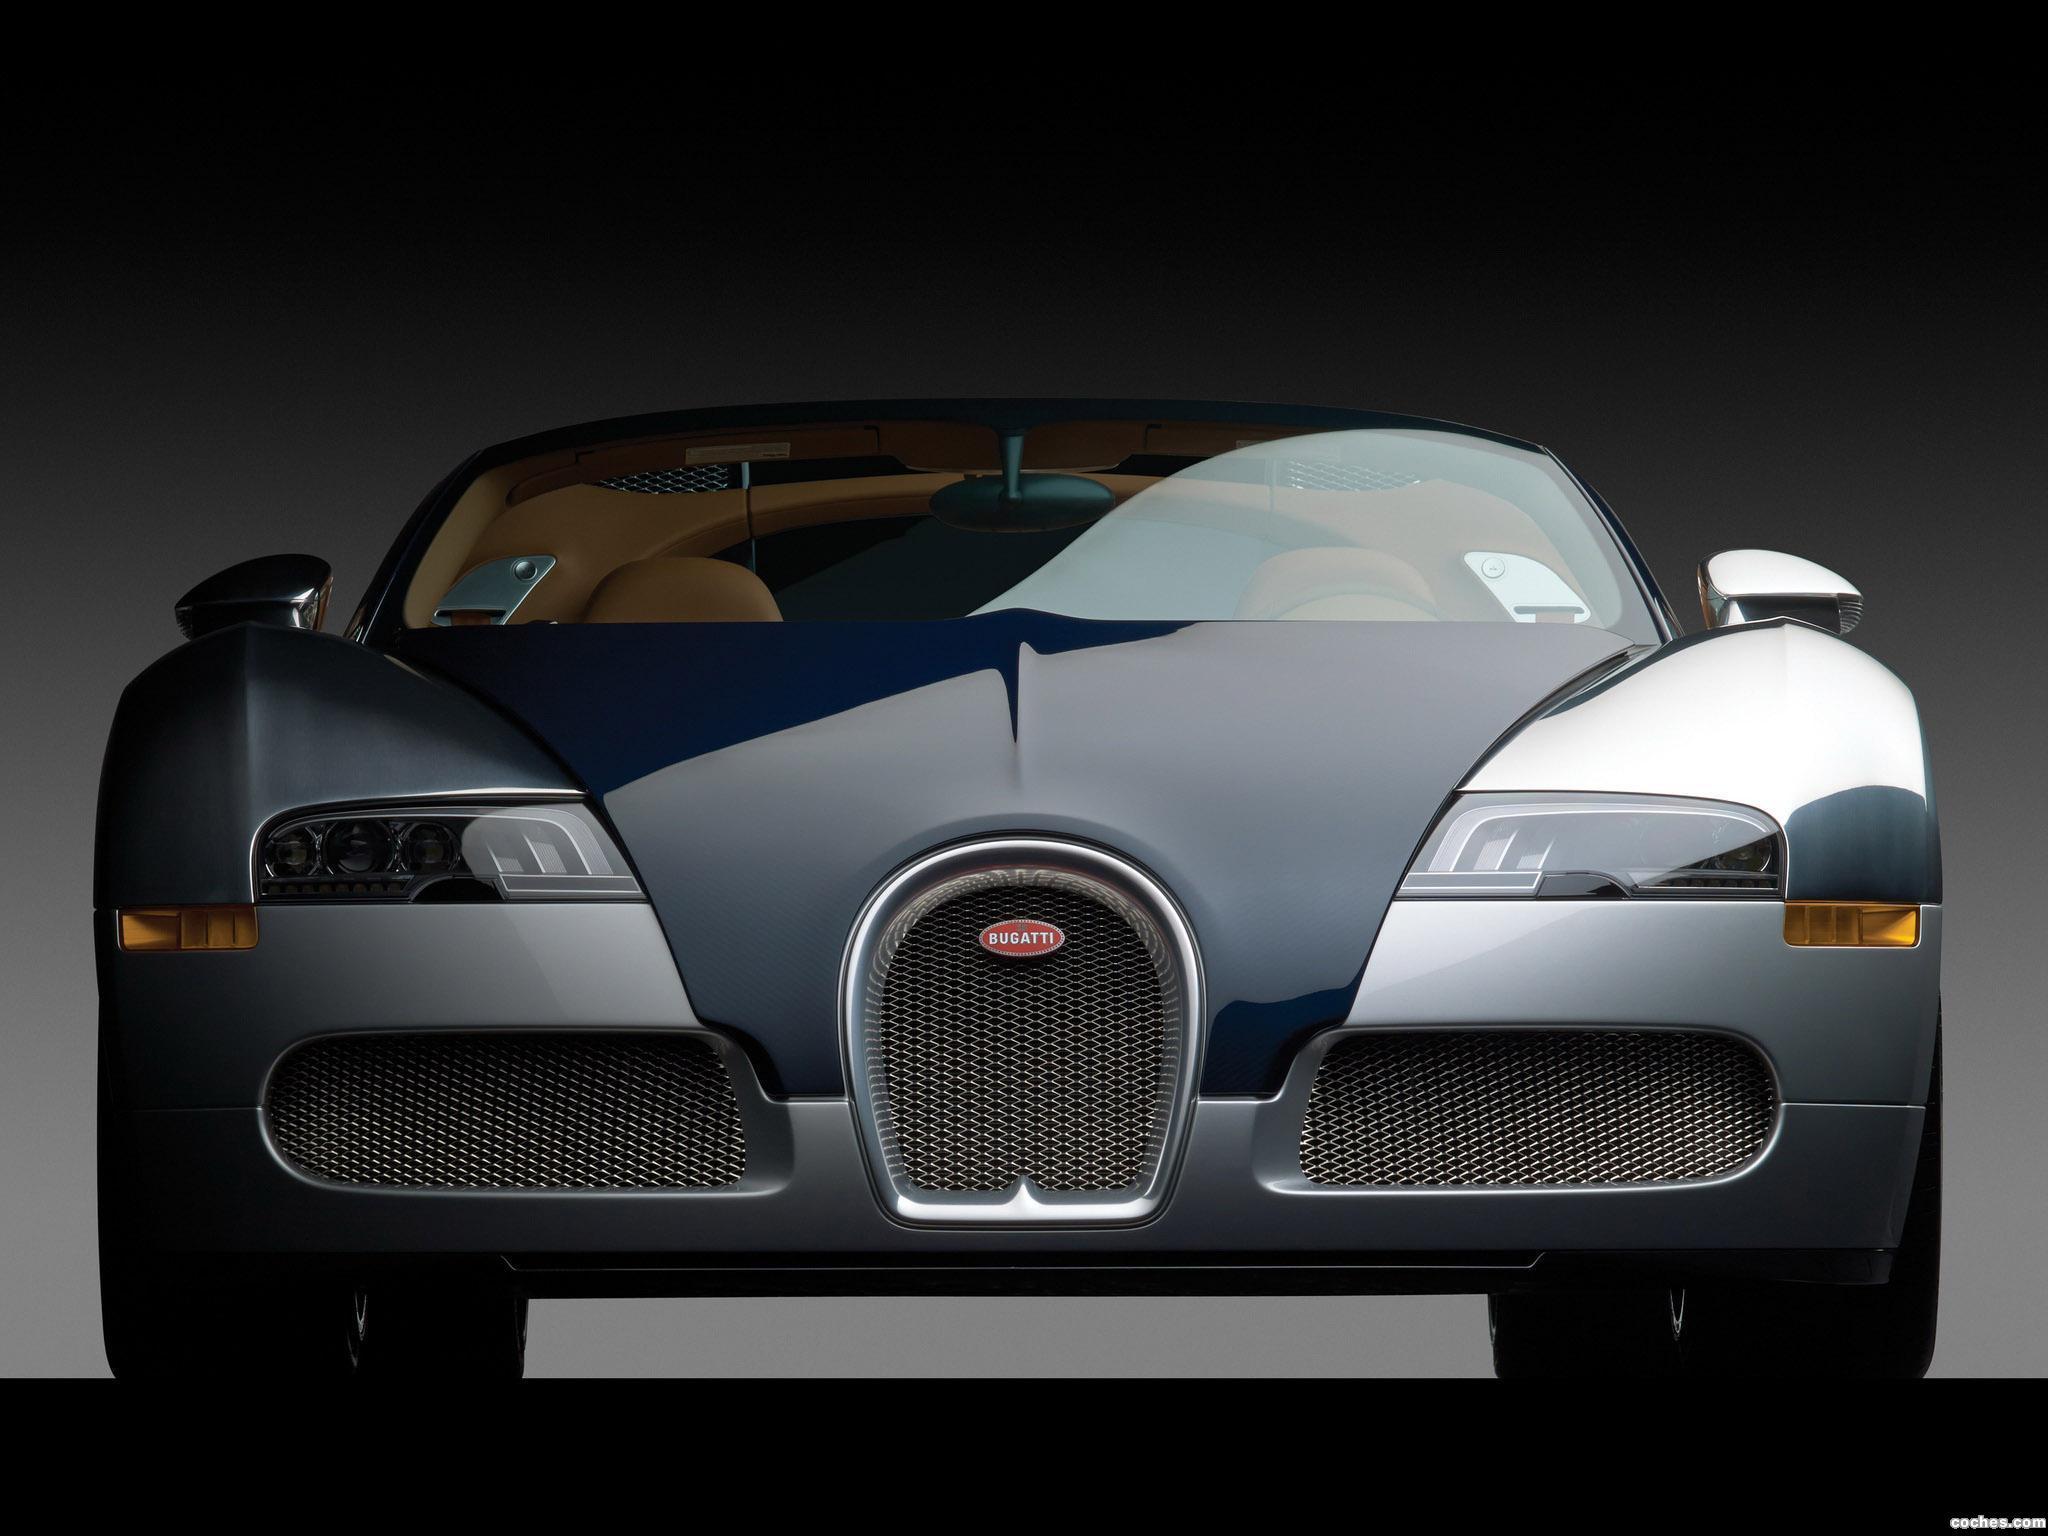 bugatti_veyron-16-4-grand-sport-bleu-nuit-2011_r8 Wonderful Lamborghini Countach Strohm De Rella Cars Trend